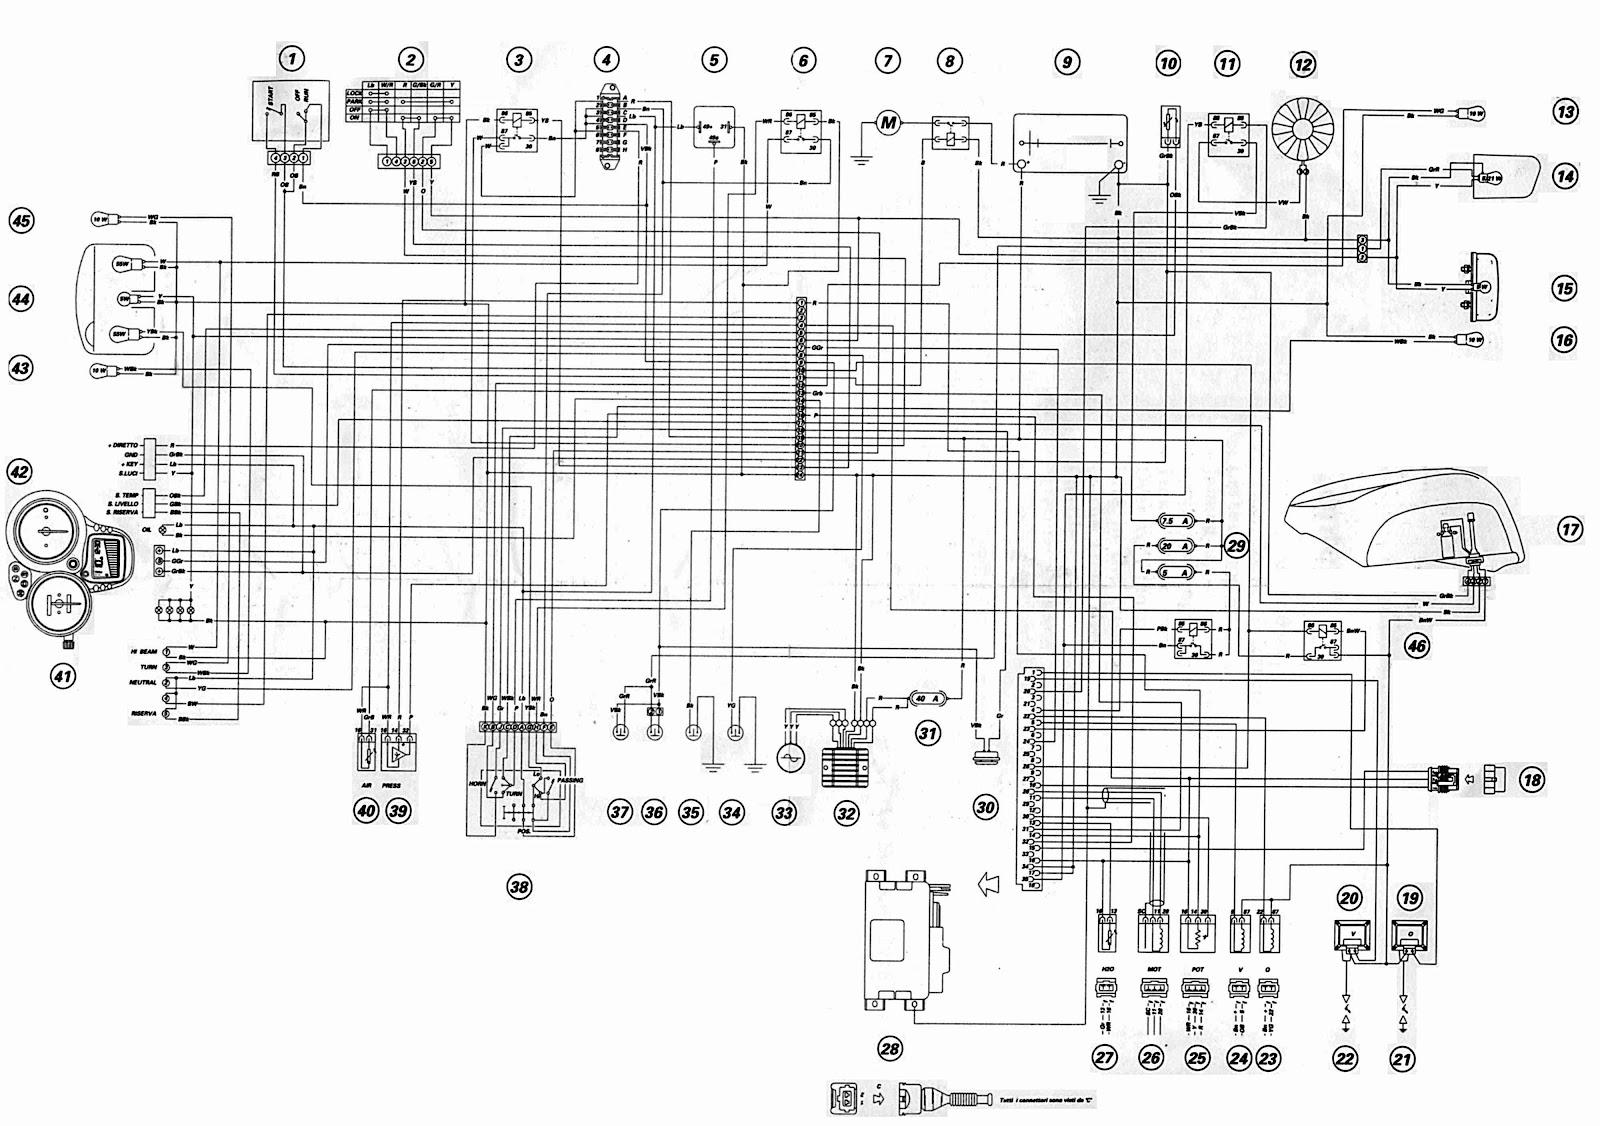 Nice suzuki sidekick wiring diagram ideas best images for wiring nice klx400sr wiring diagram frieze electrical and wiring diagram cheapraybanclubmaster Choice Image